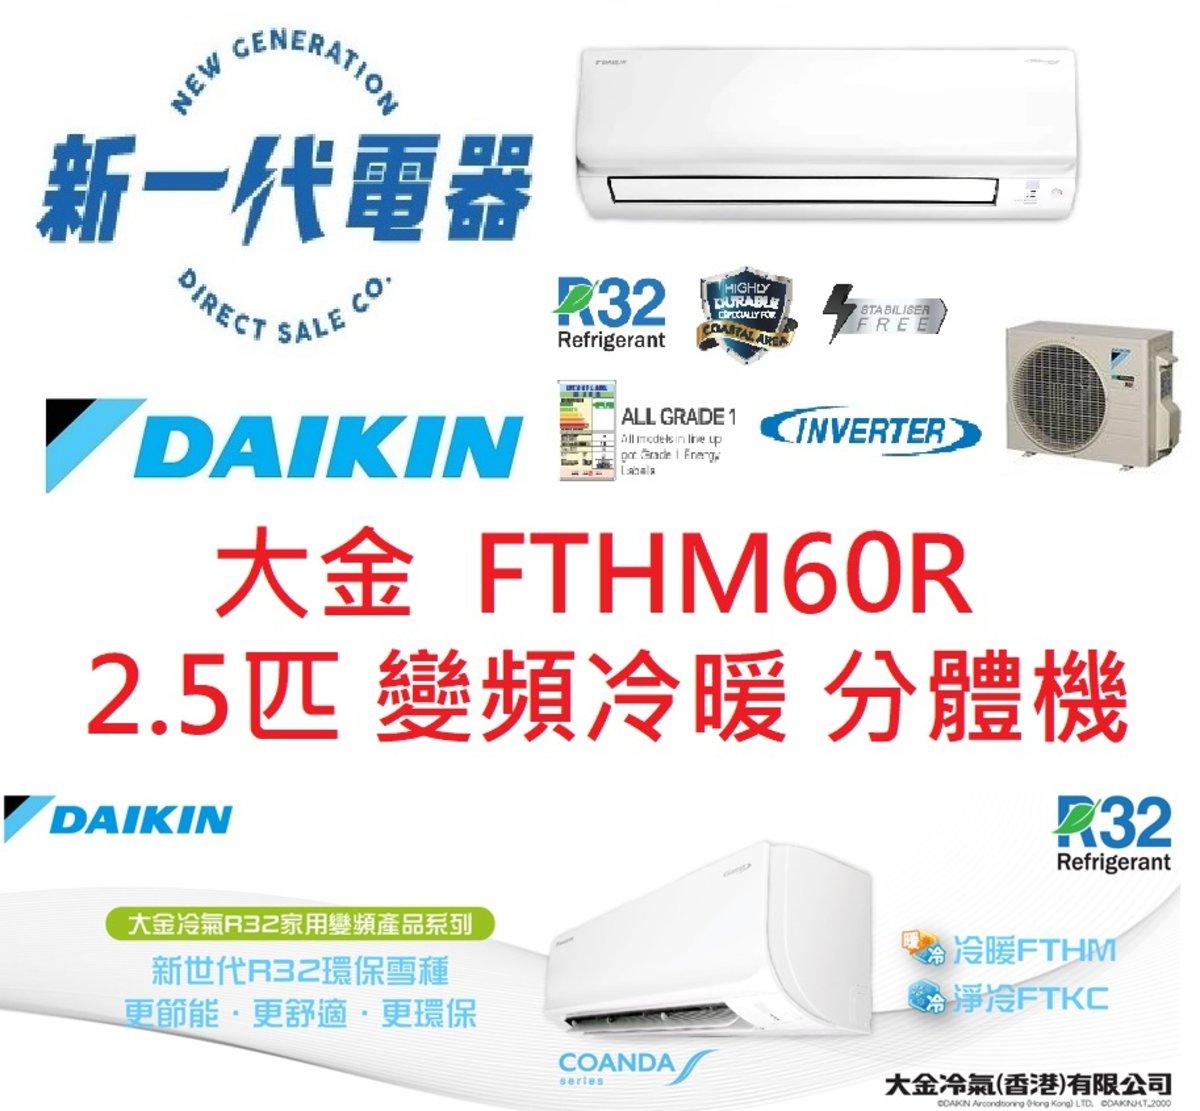 FTHM60RV1N   R32 康達變頻冷暖系列